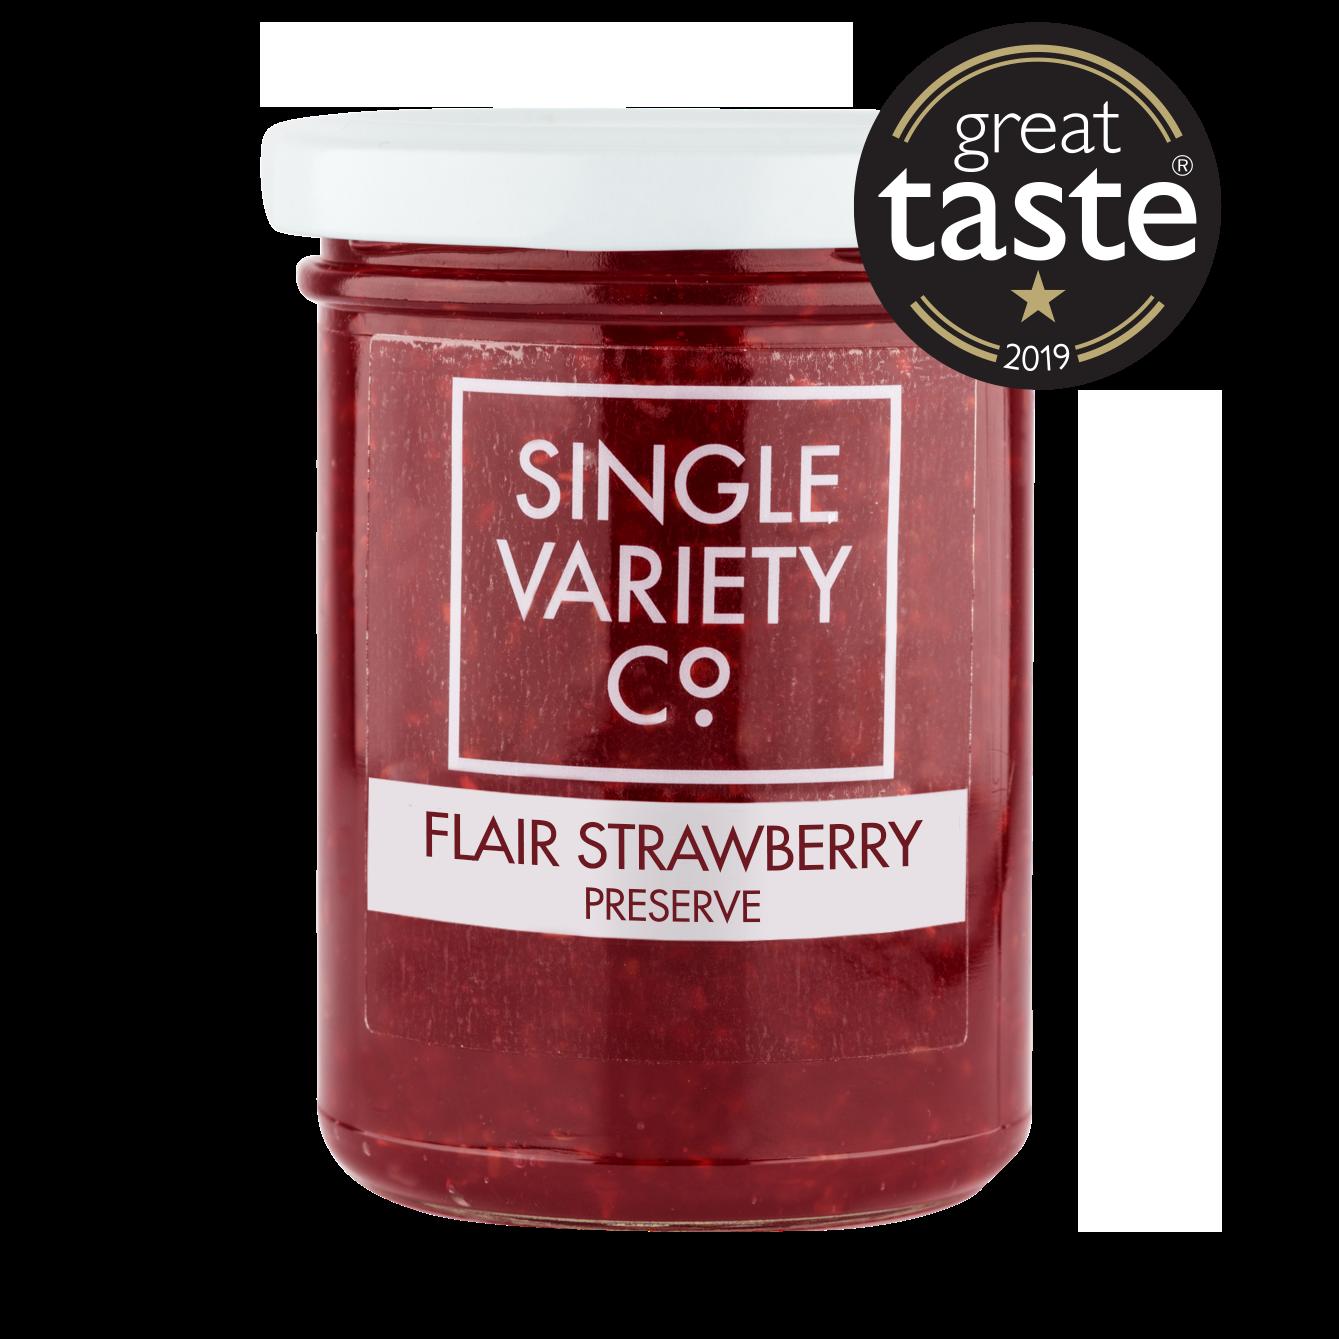 Flair Strawberry Preserve